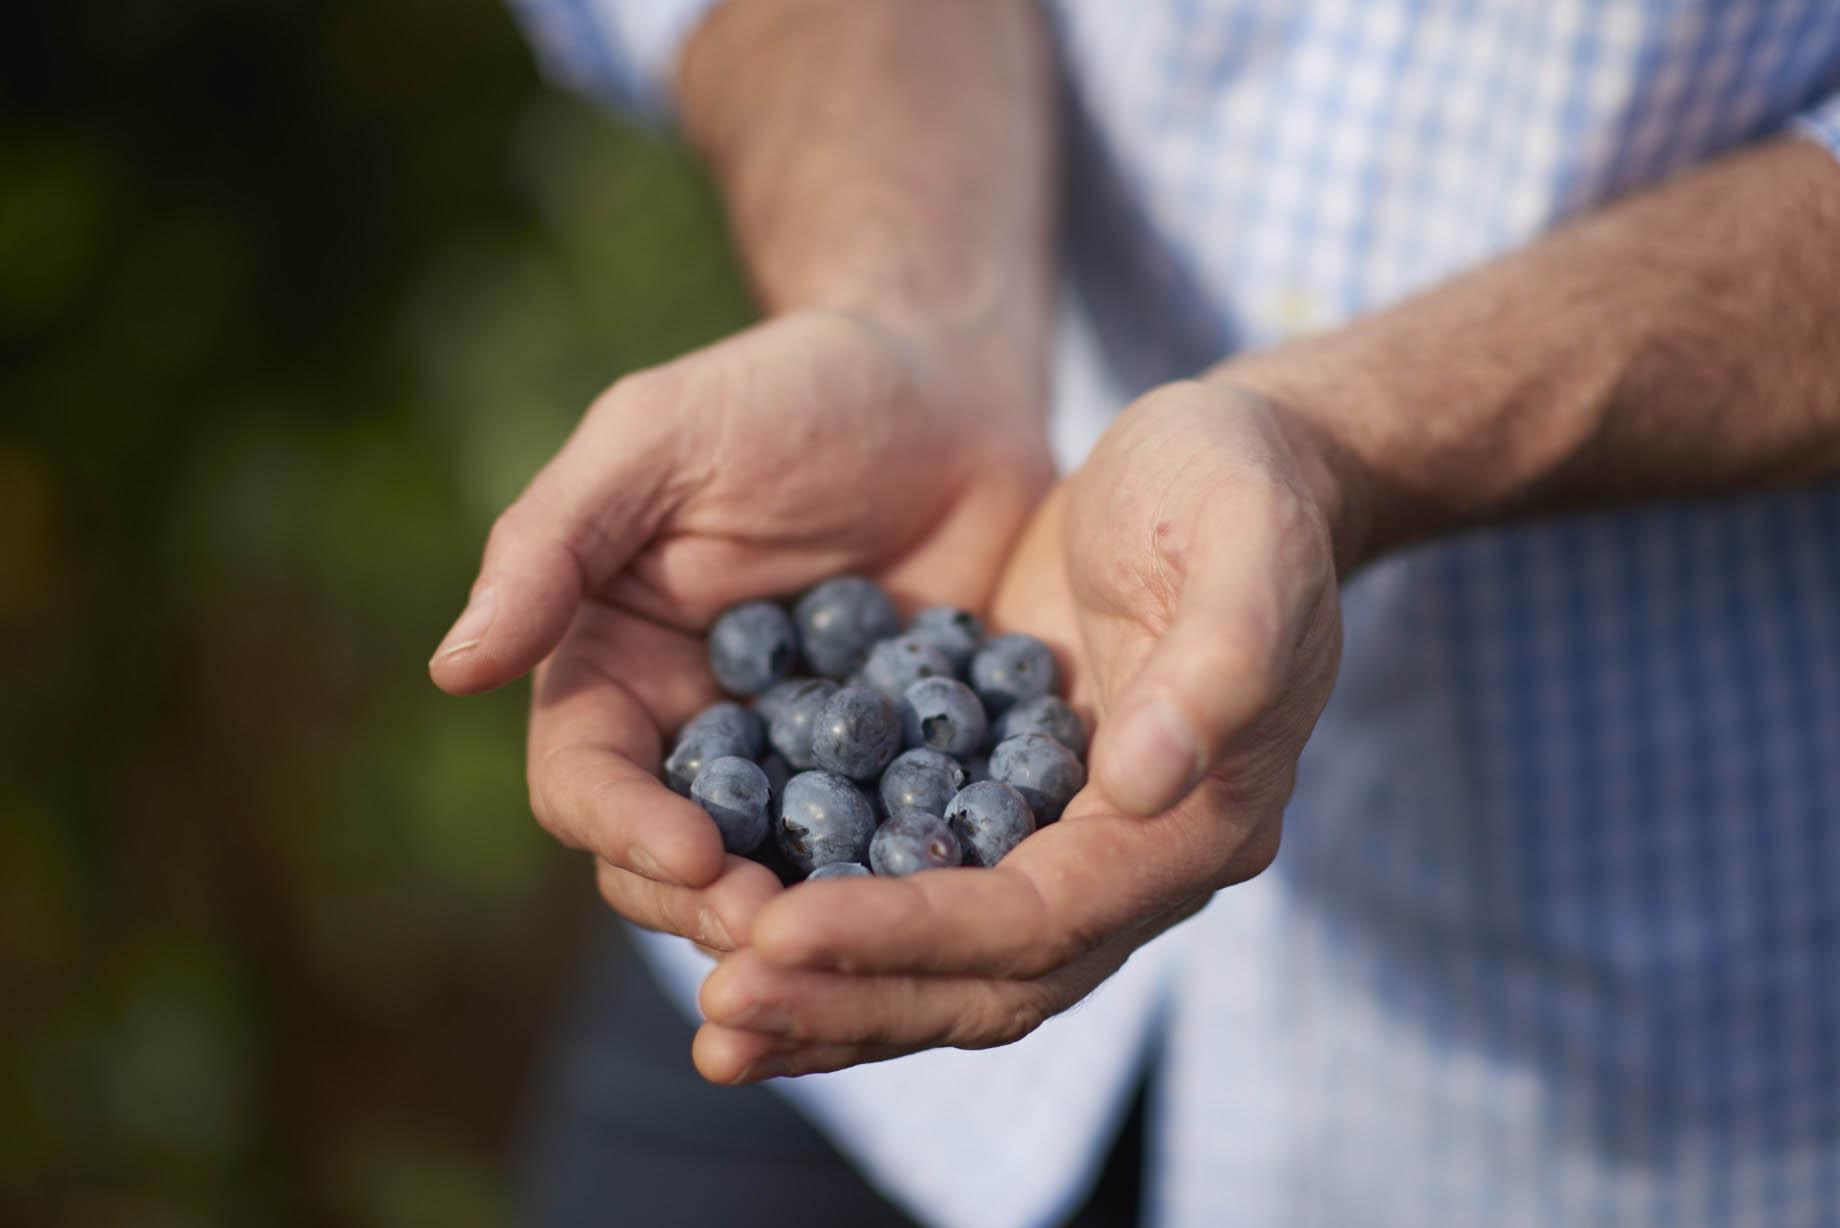 Blueberries_Mundubbera_160921_0020